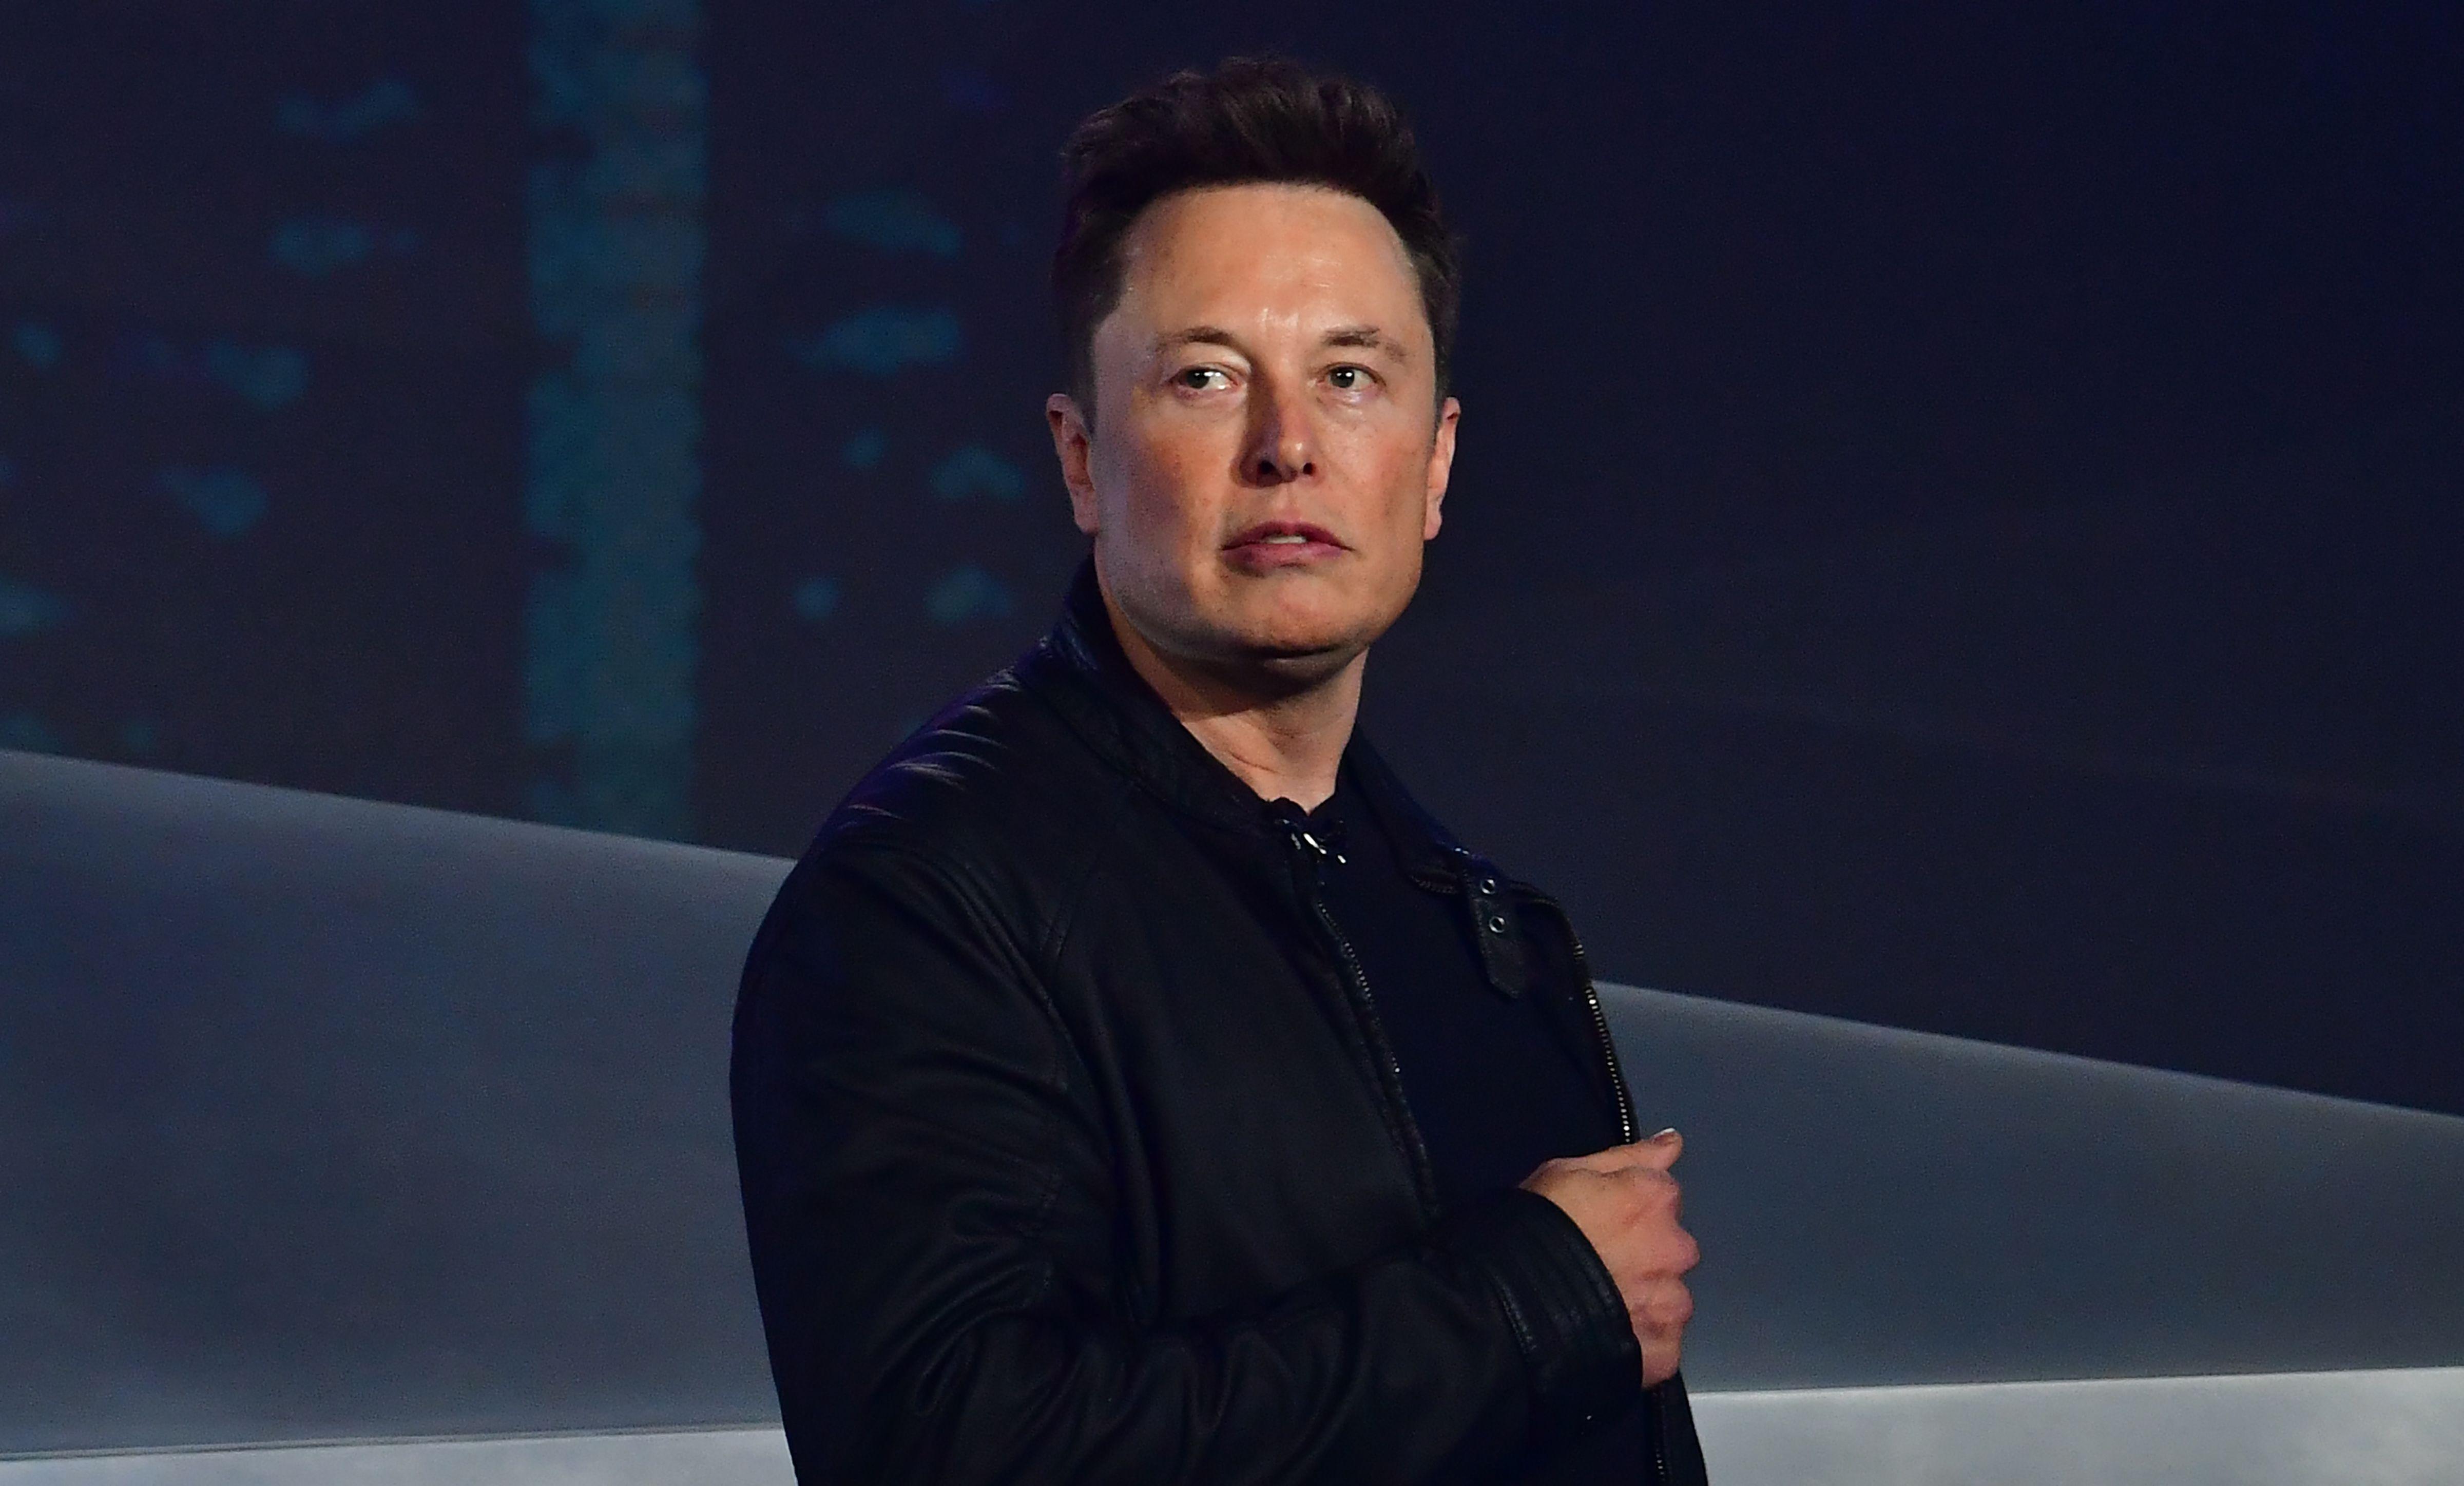 Elon Musk Is Mad at Bill Gates—After He Chose Porsche Over Tesla as First EV